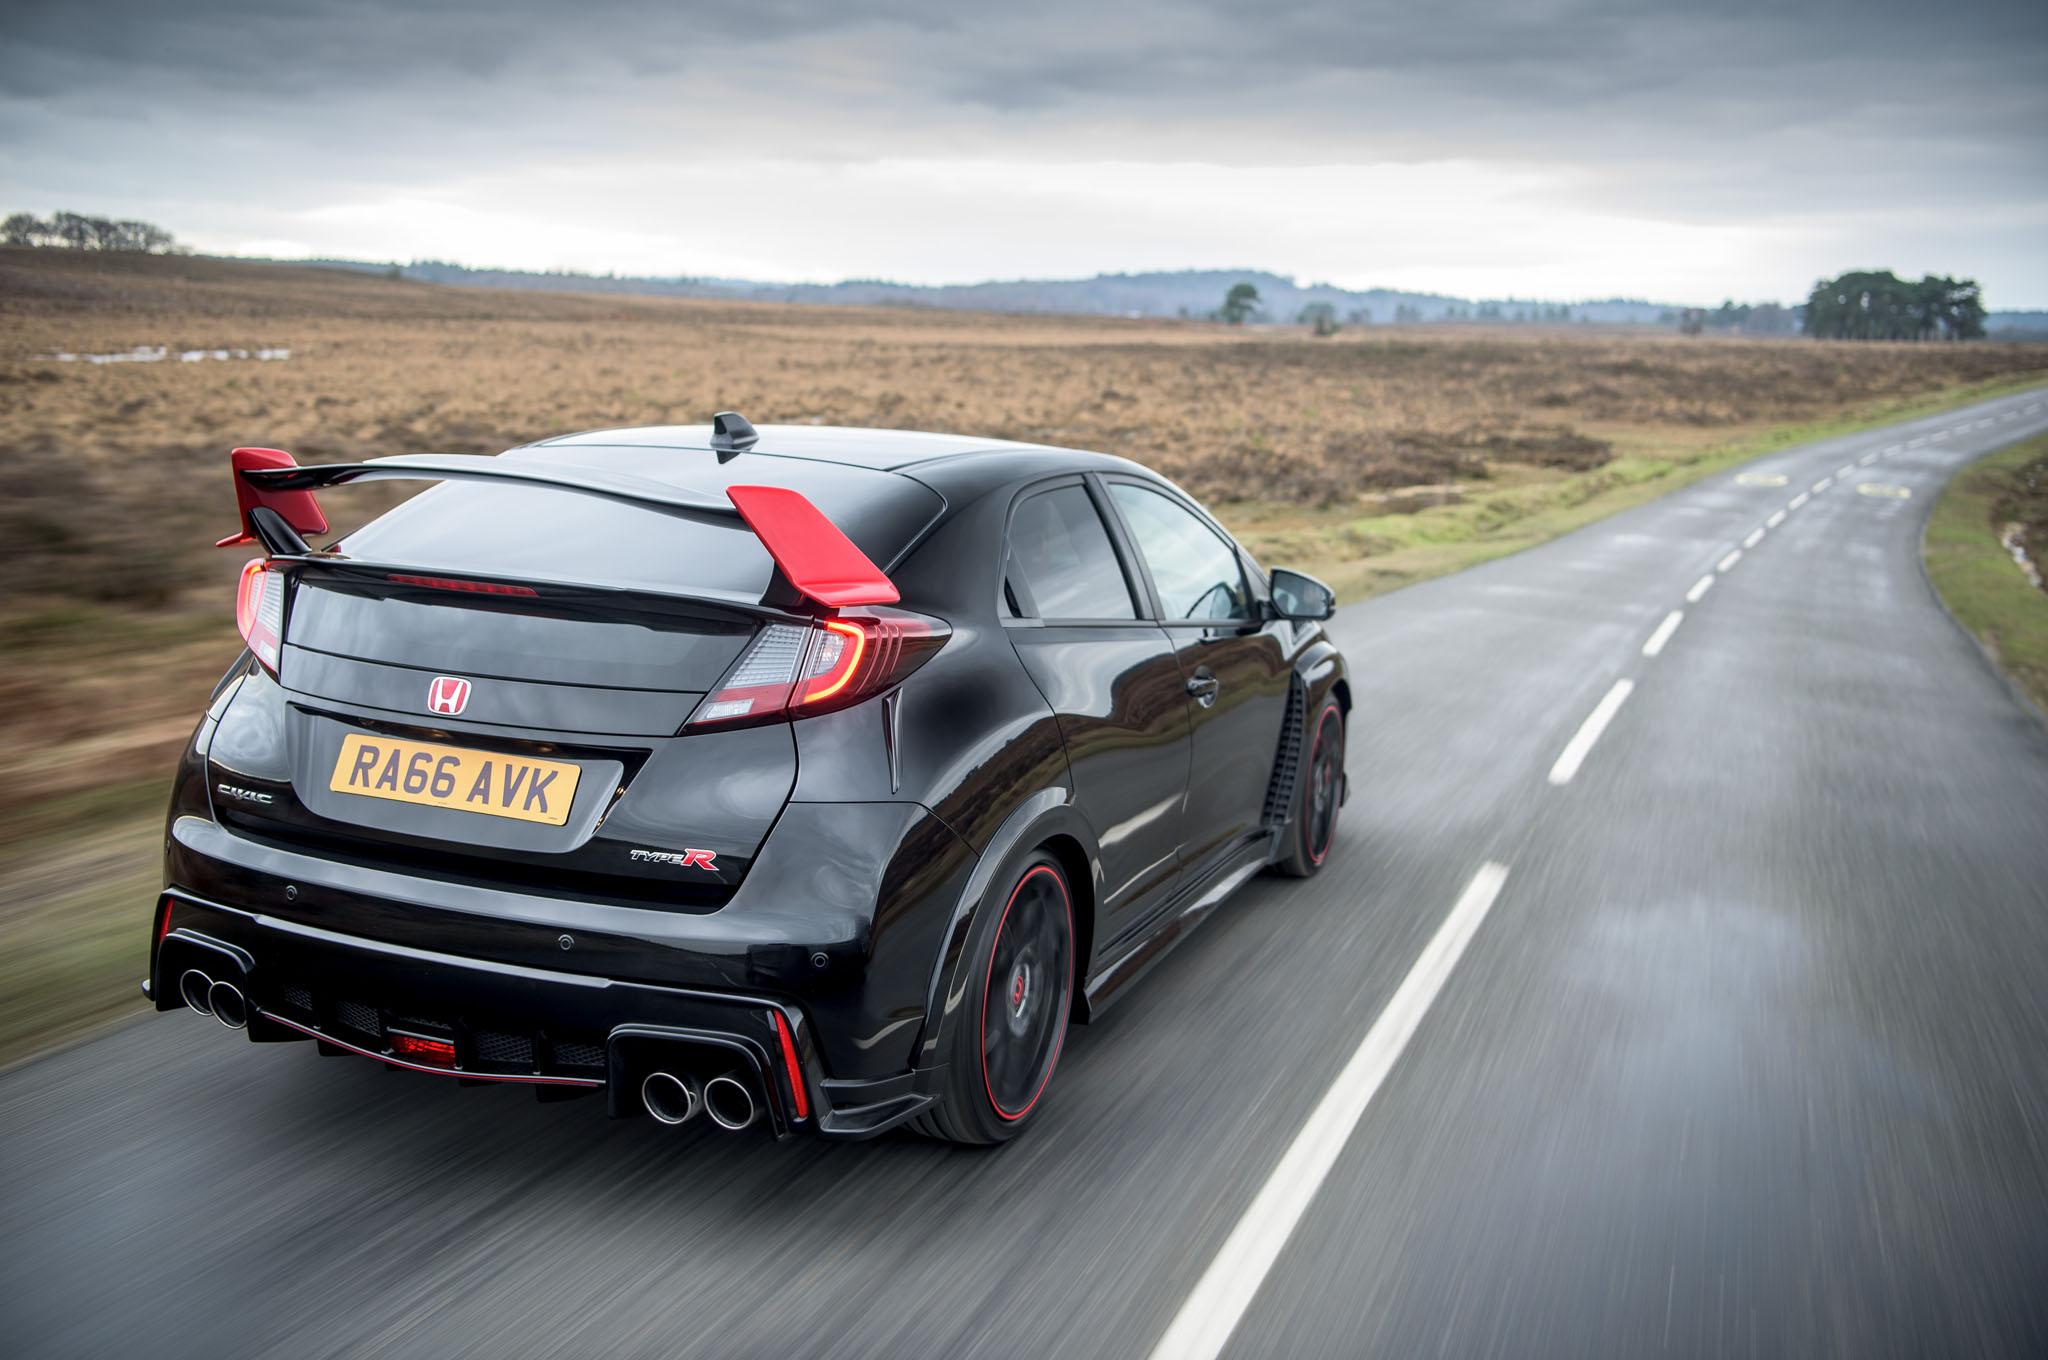 Honda Civic Type R Black Edition Is Special Sendoff